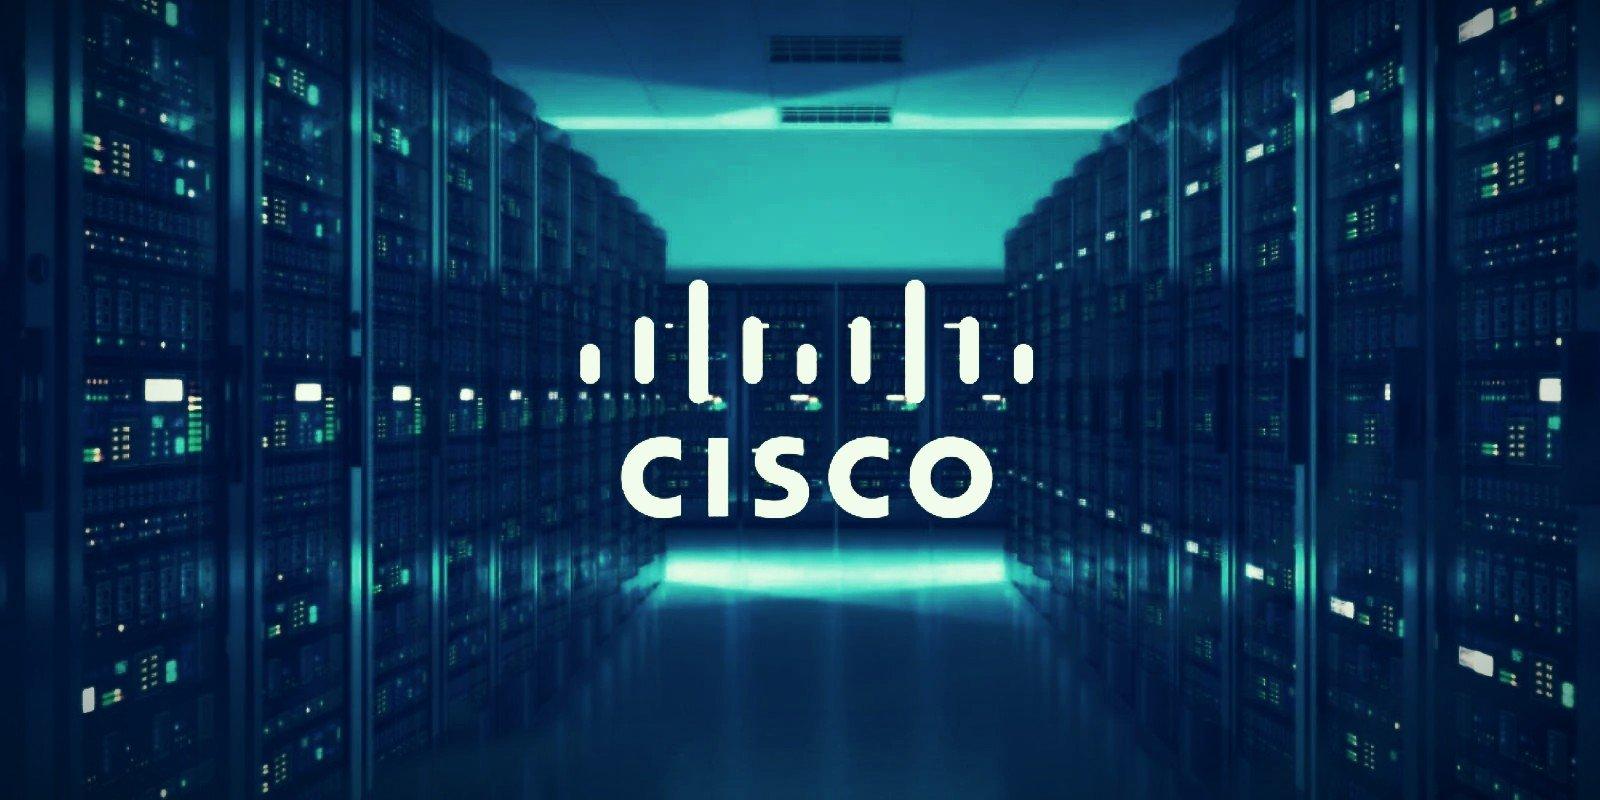 Ex-Cisco engineer who nuked 16k WebEx accounts sent to prison